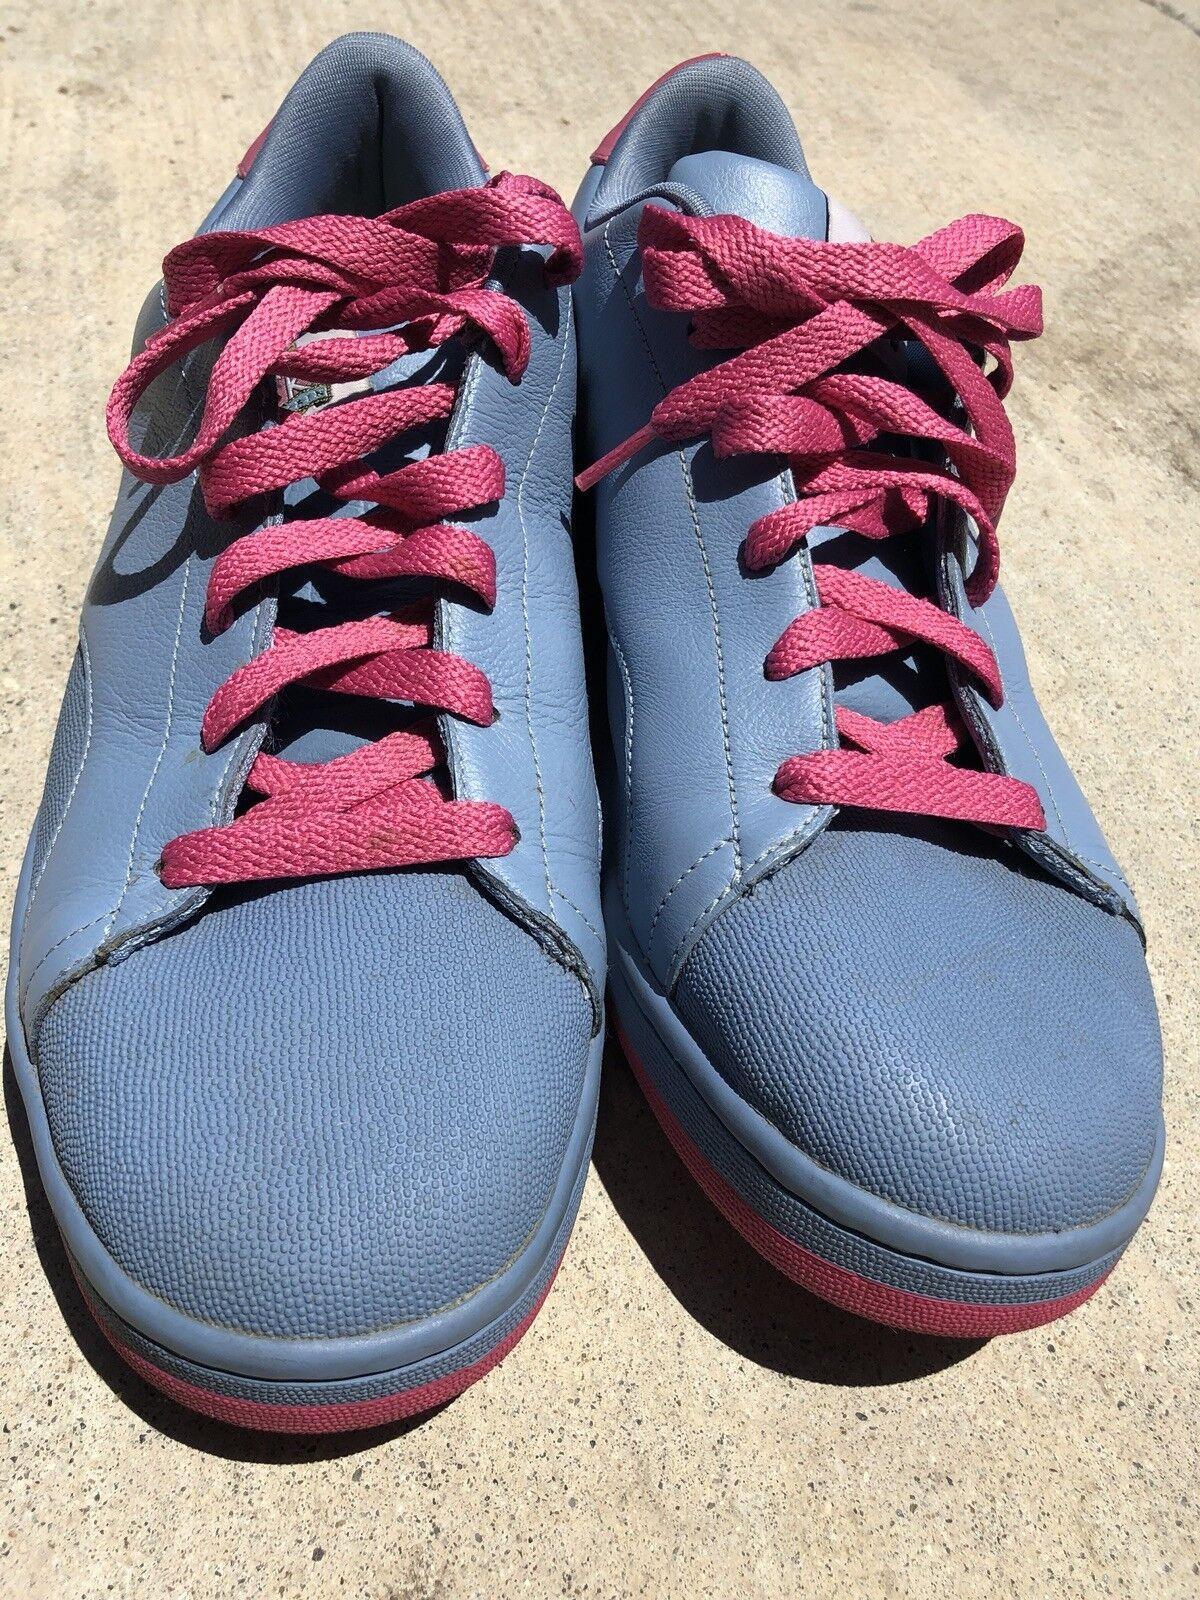 REEBOK BBC Men's Board Flip ICE CREAM Blue  Pink Sneakers Shoes Size  13